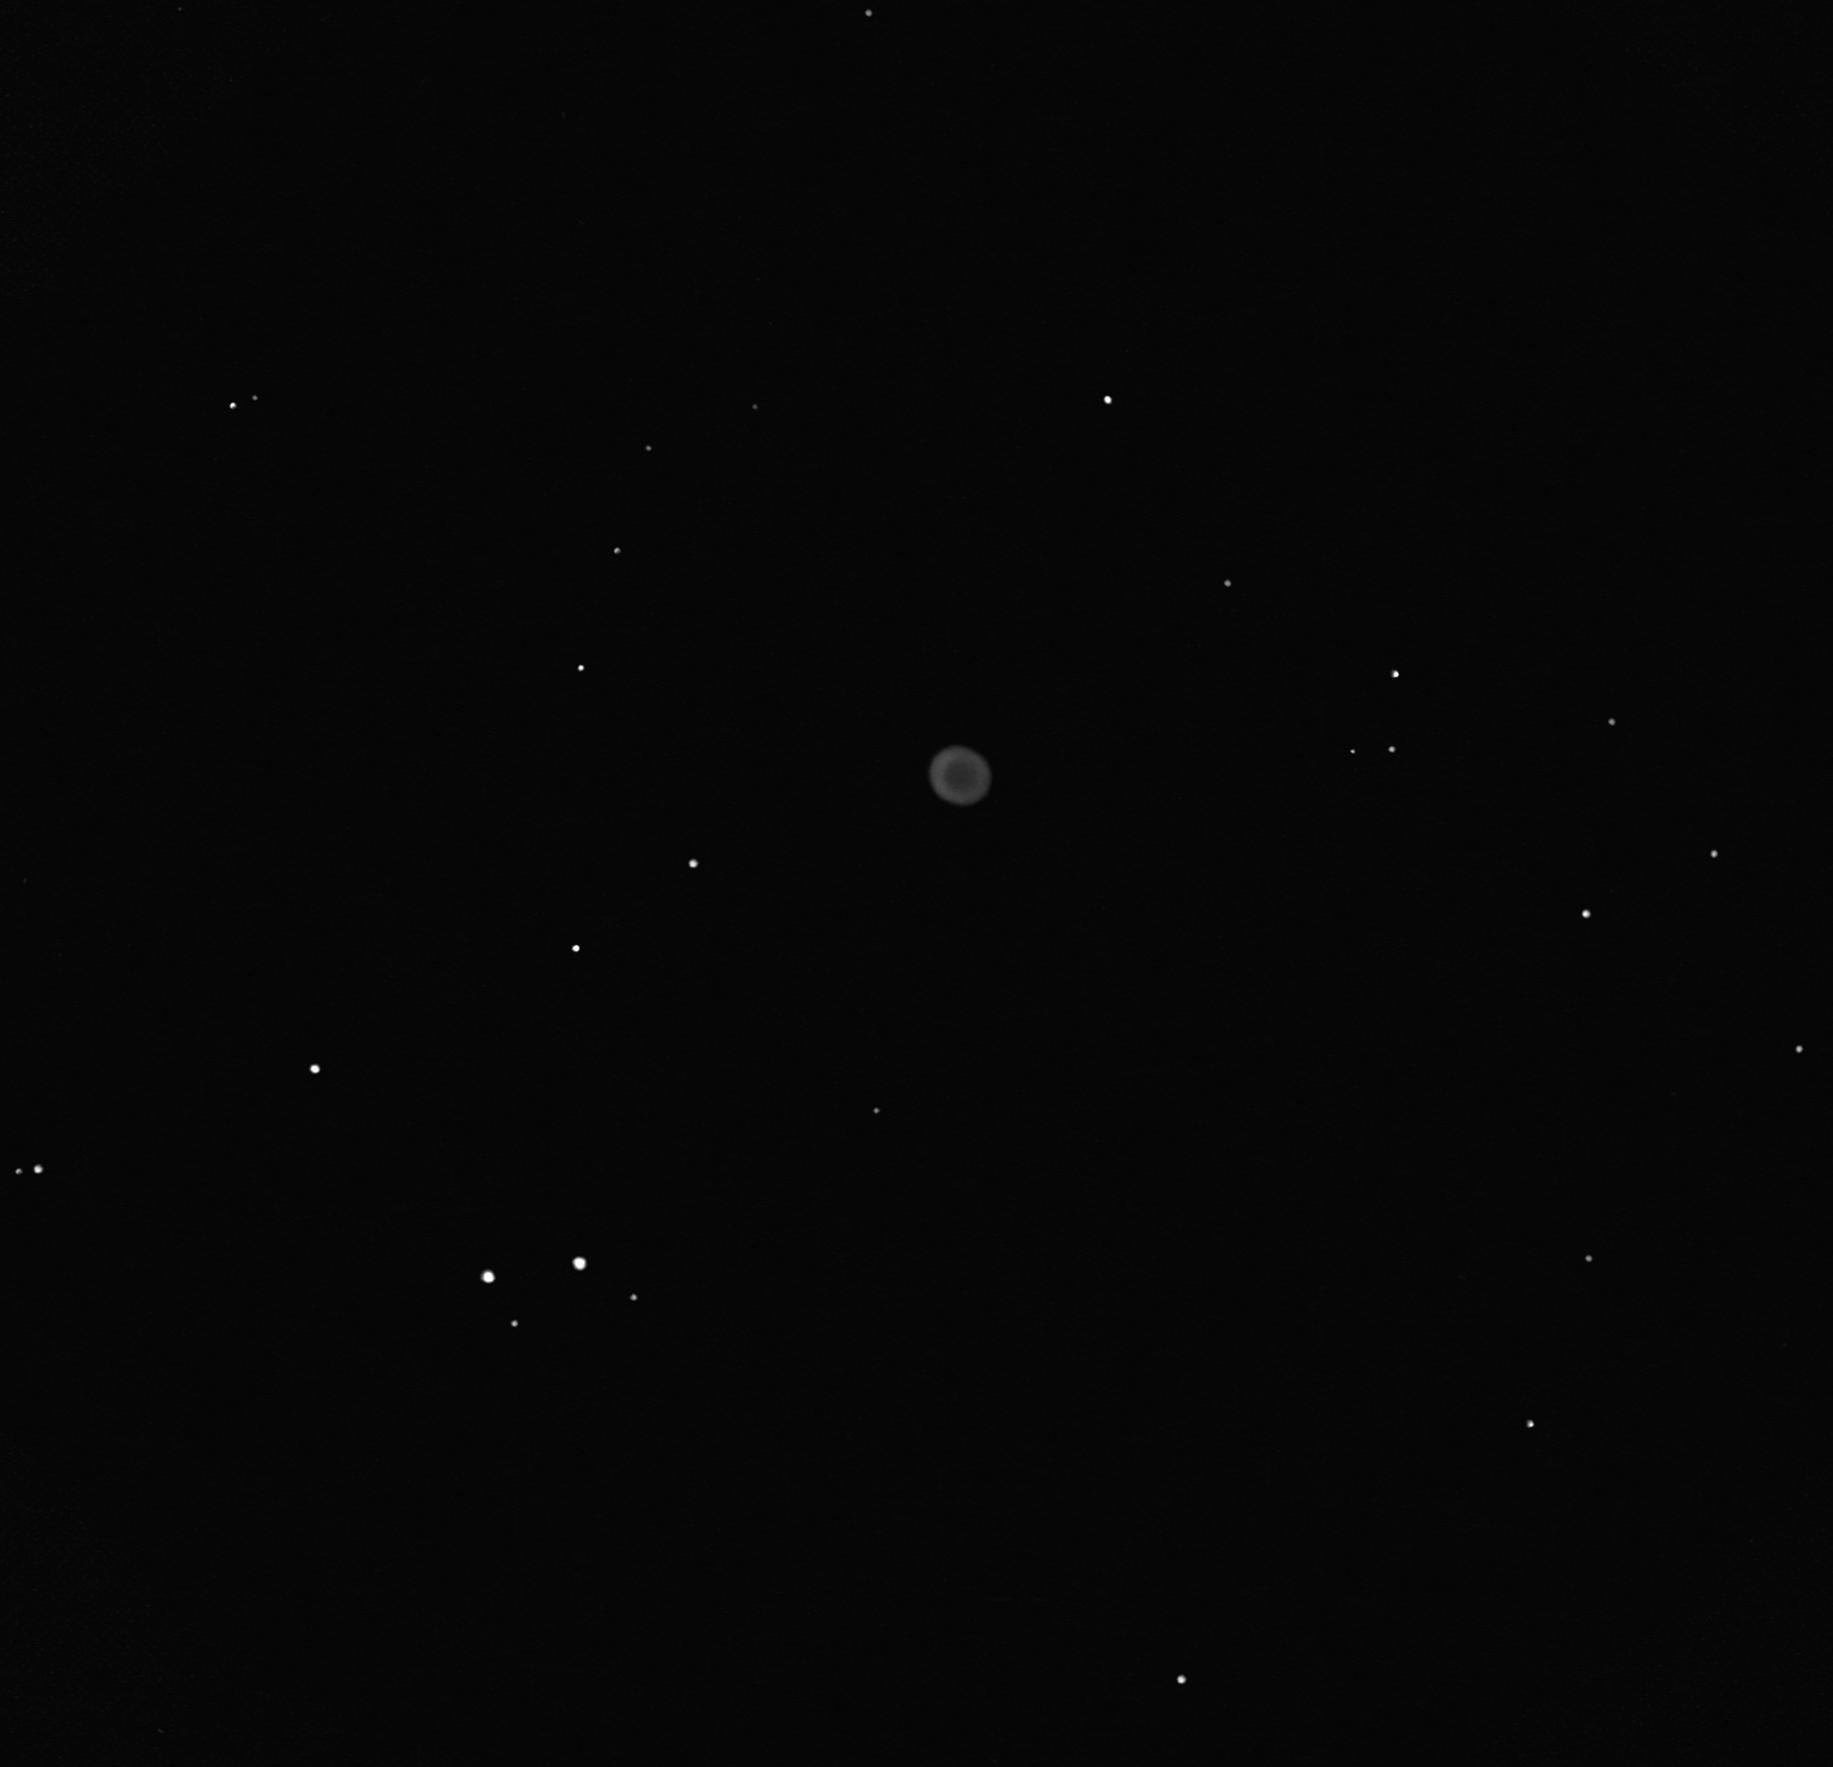 ngc2792 planetary nebula